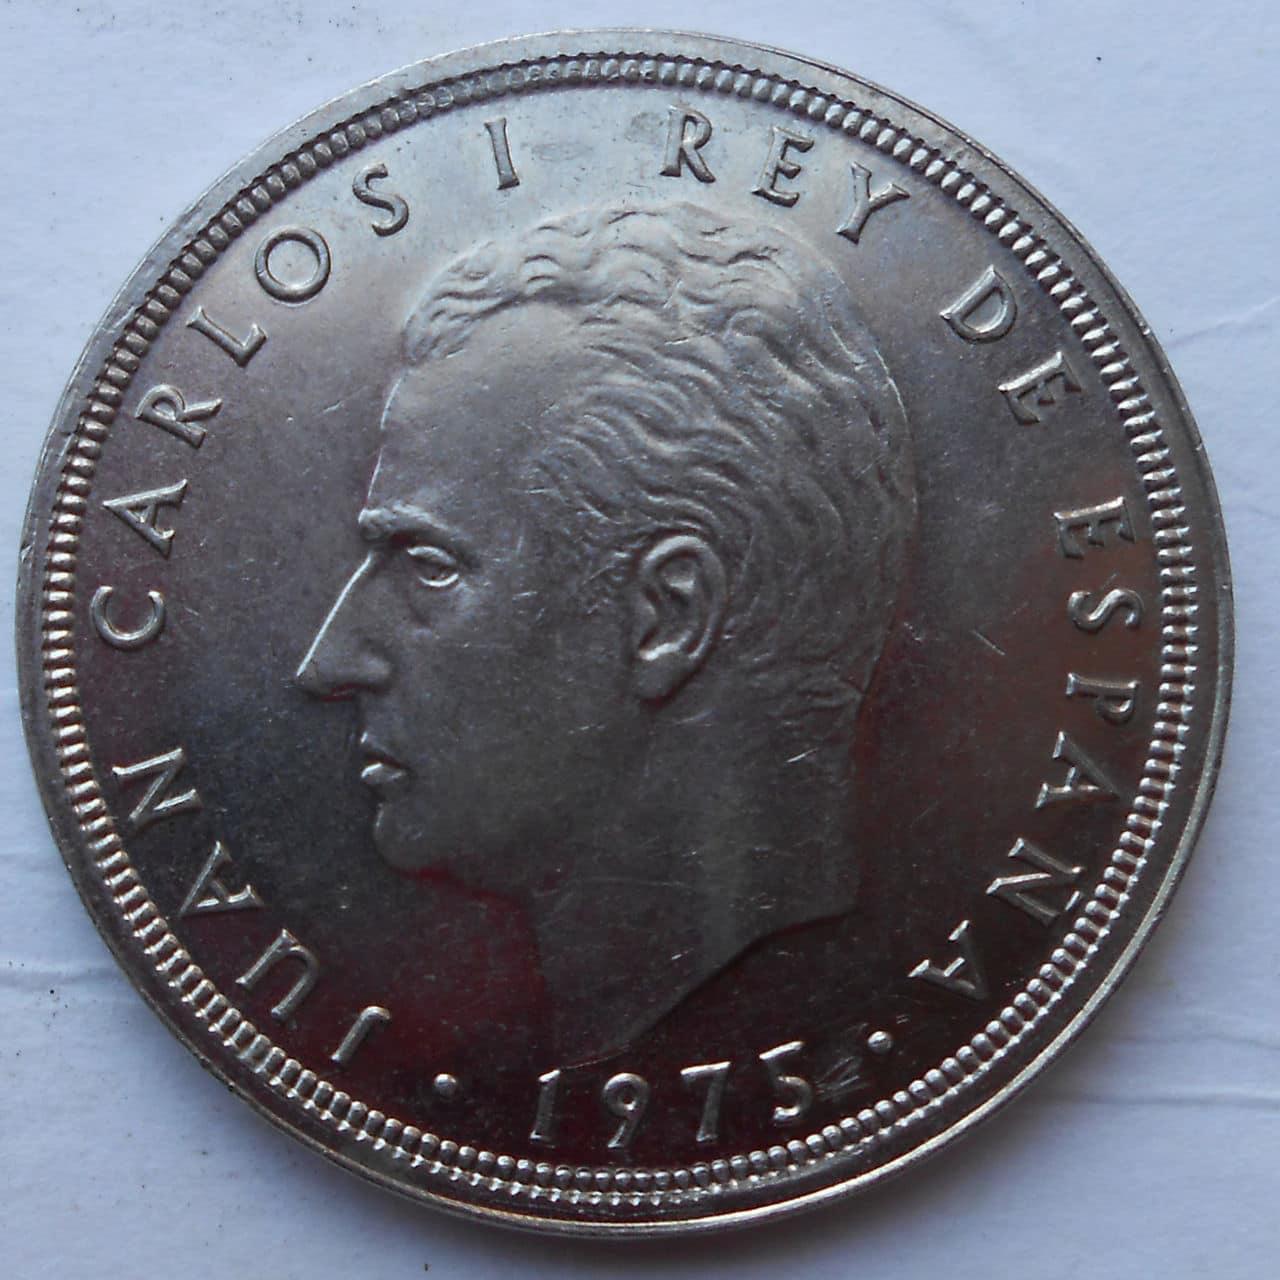 50 pesetas 1975 * 19 - 80  Juan Carlos I DSCN0673